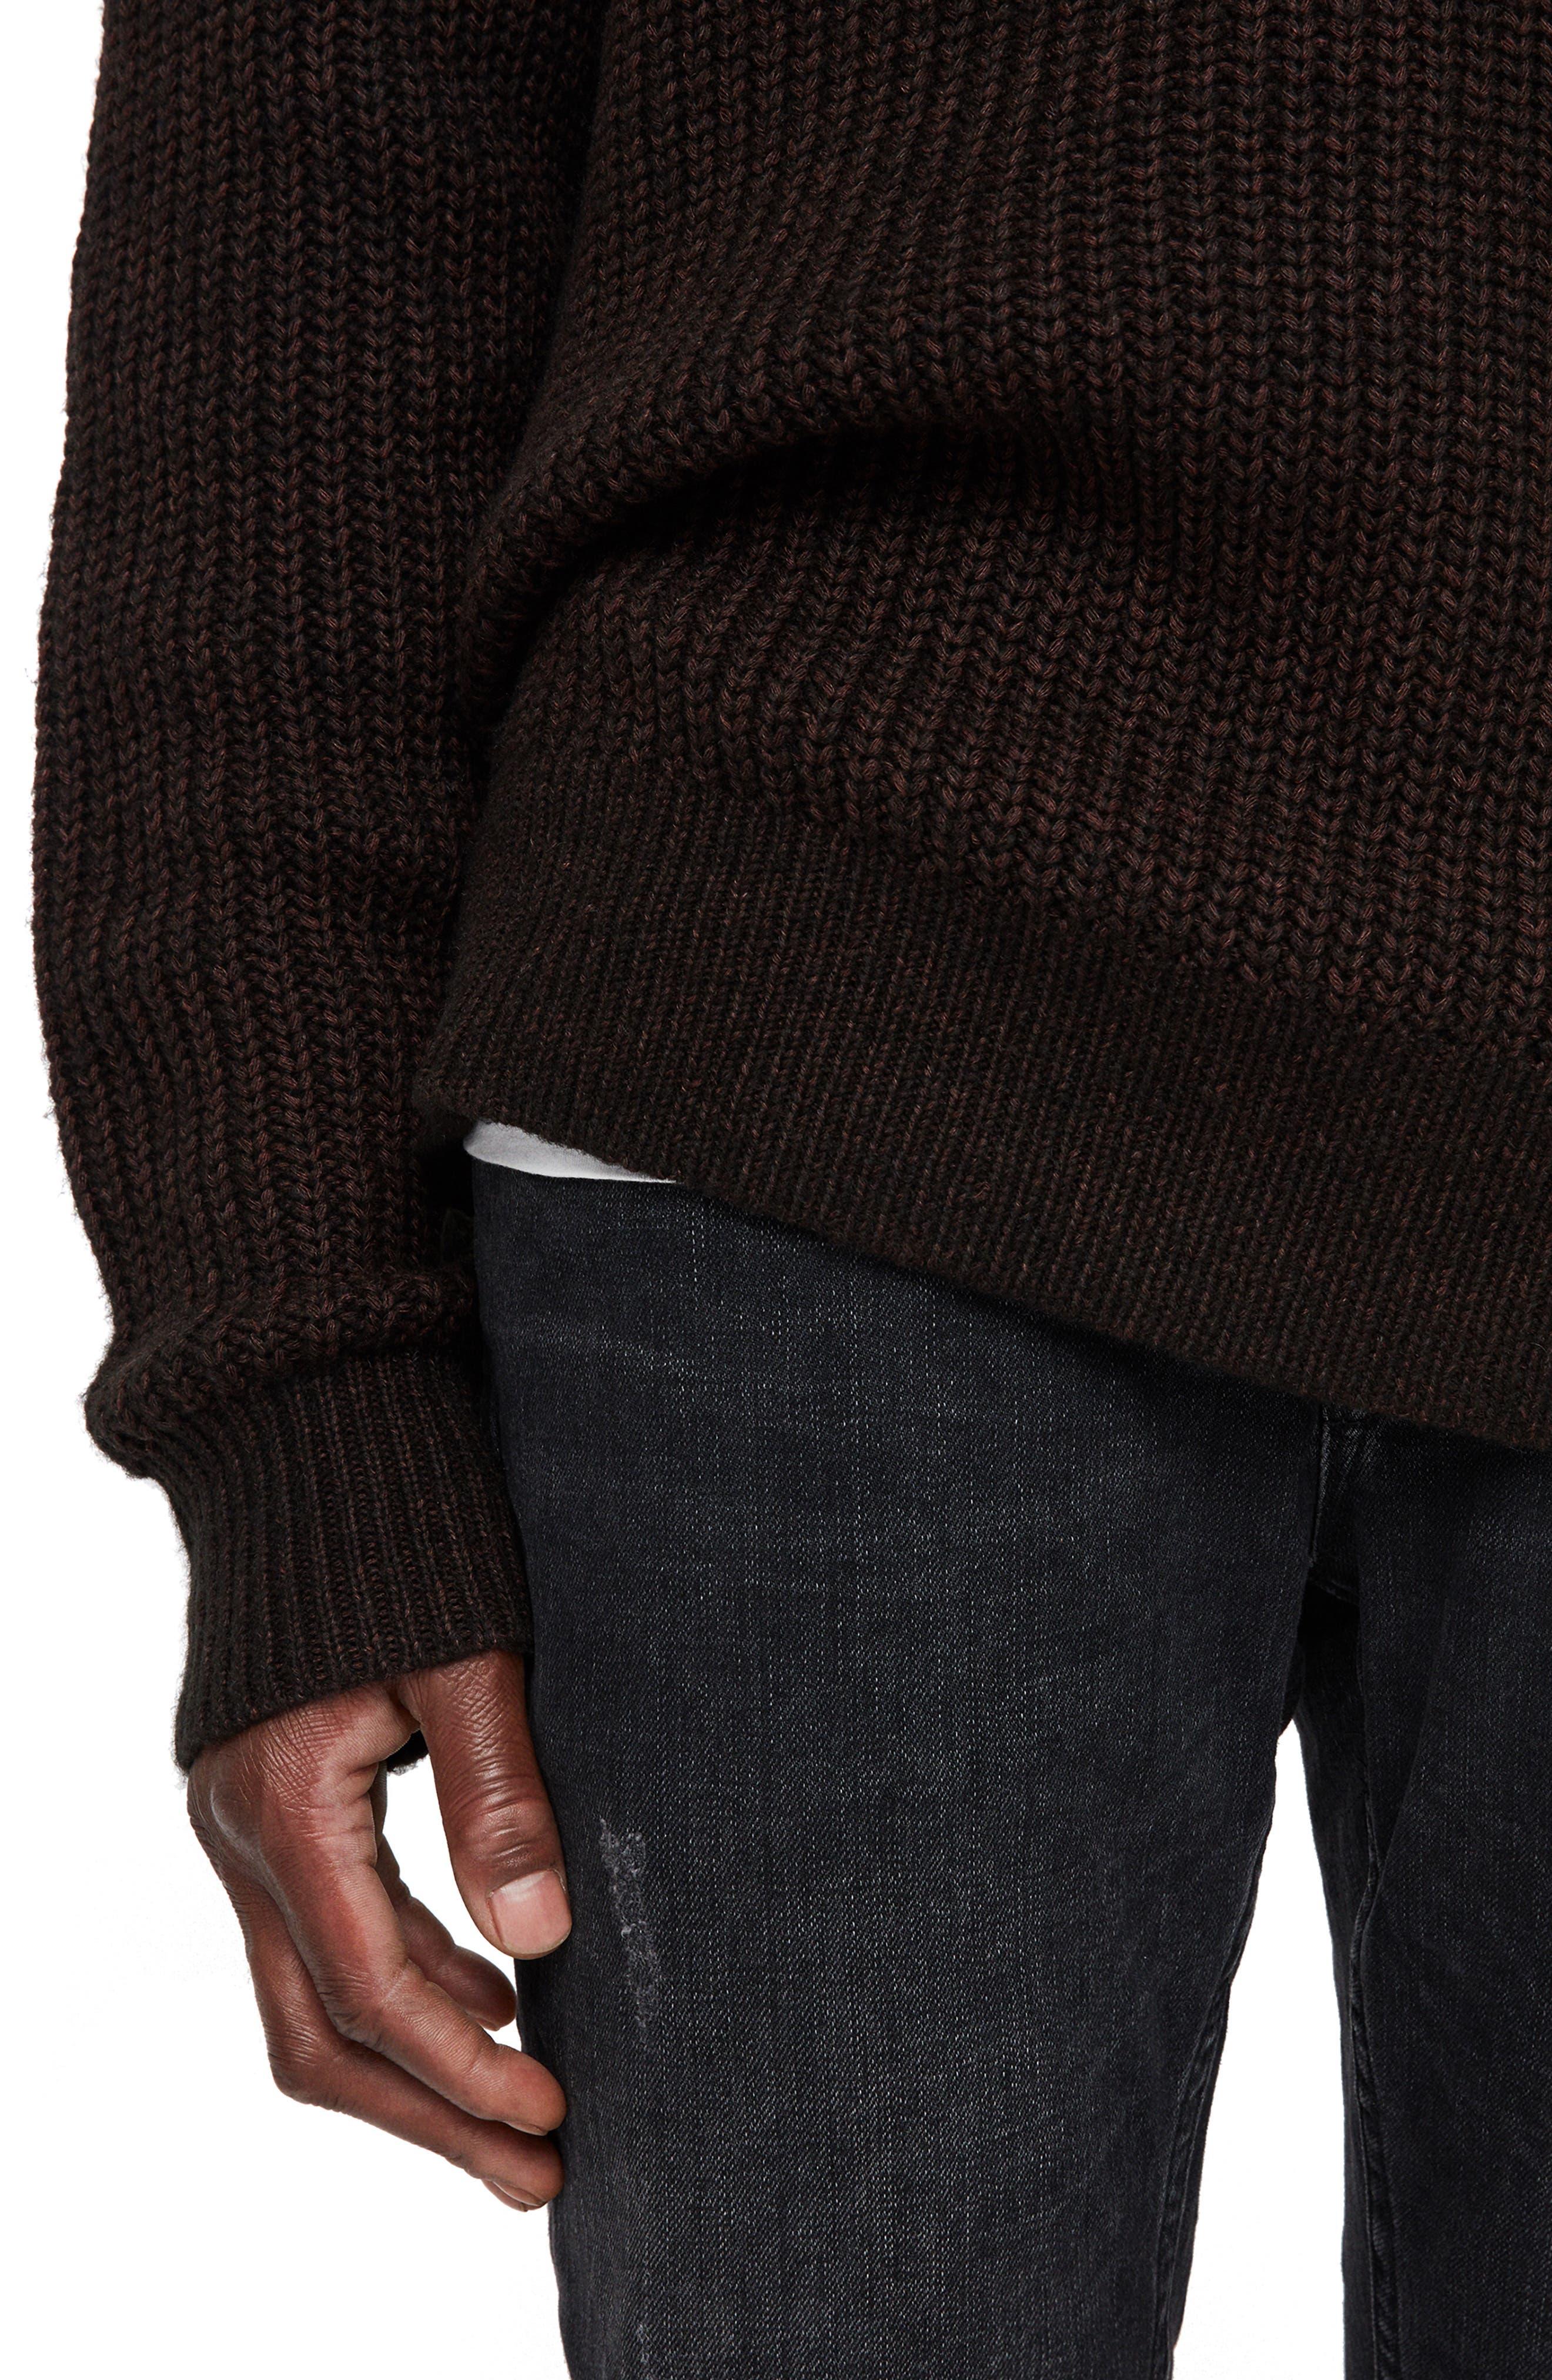 Tilman Regular Fit Sweater,                             Alternate thumbnail 5, color,                             001